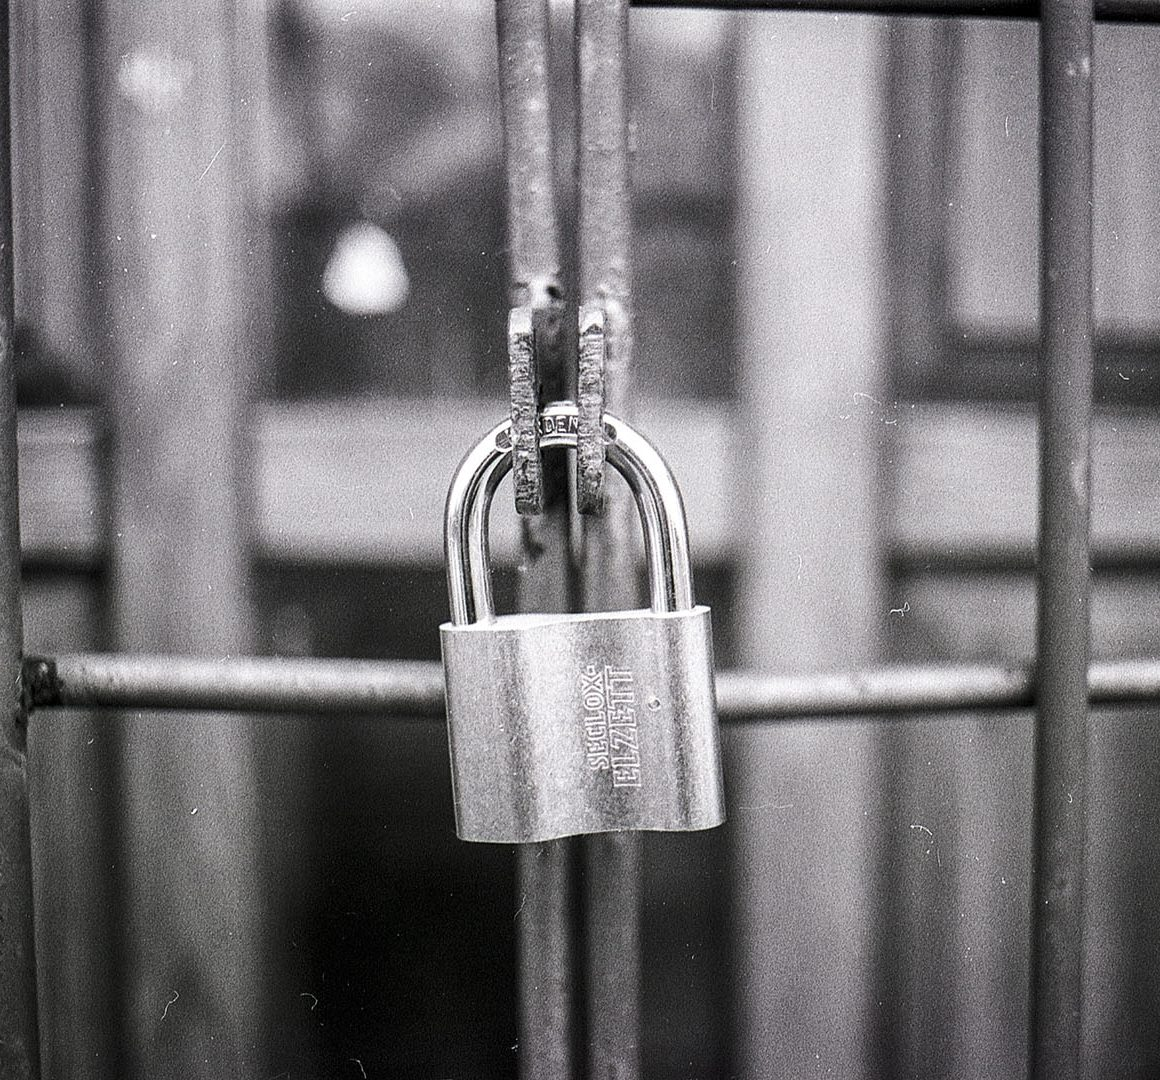 access-black-and-white-blur-270514a